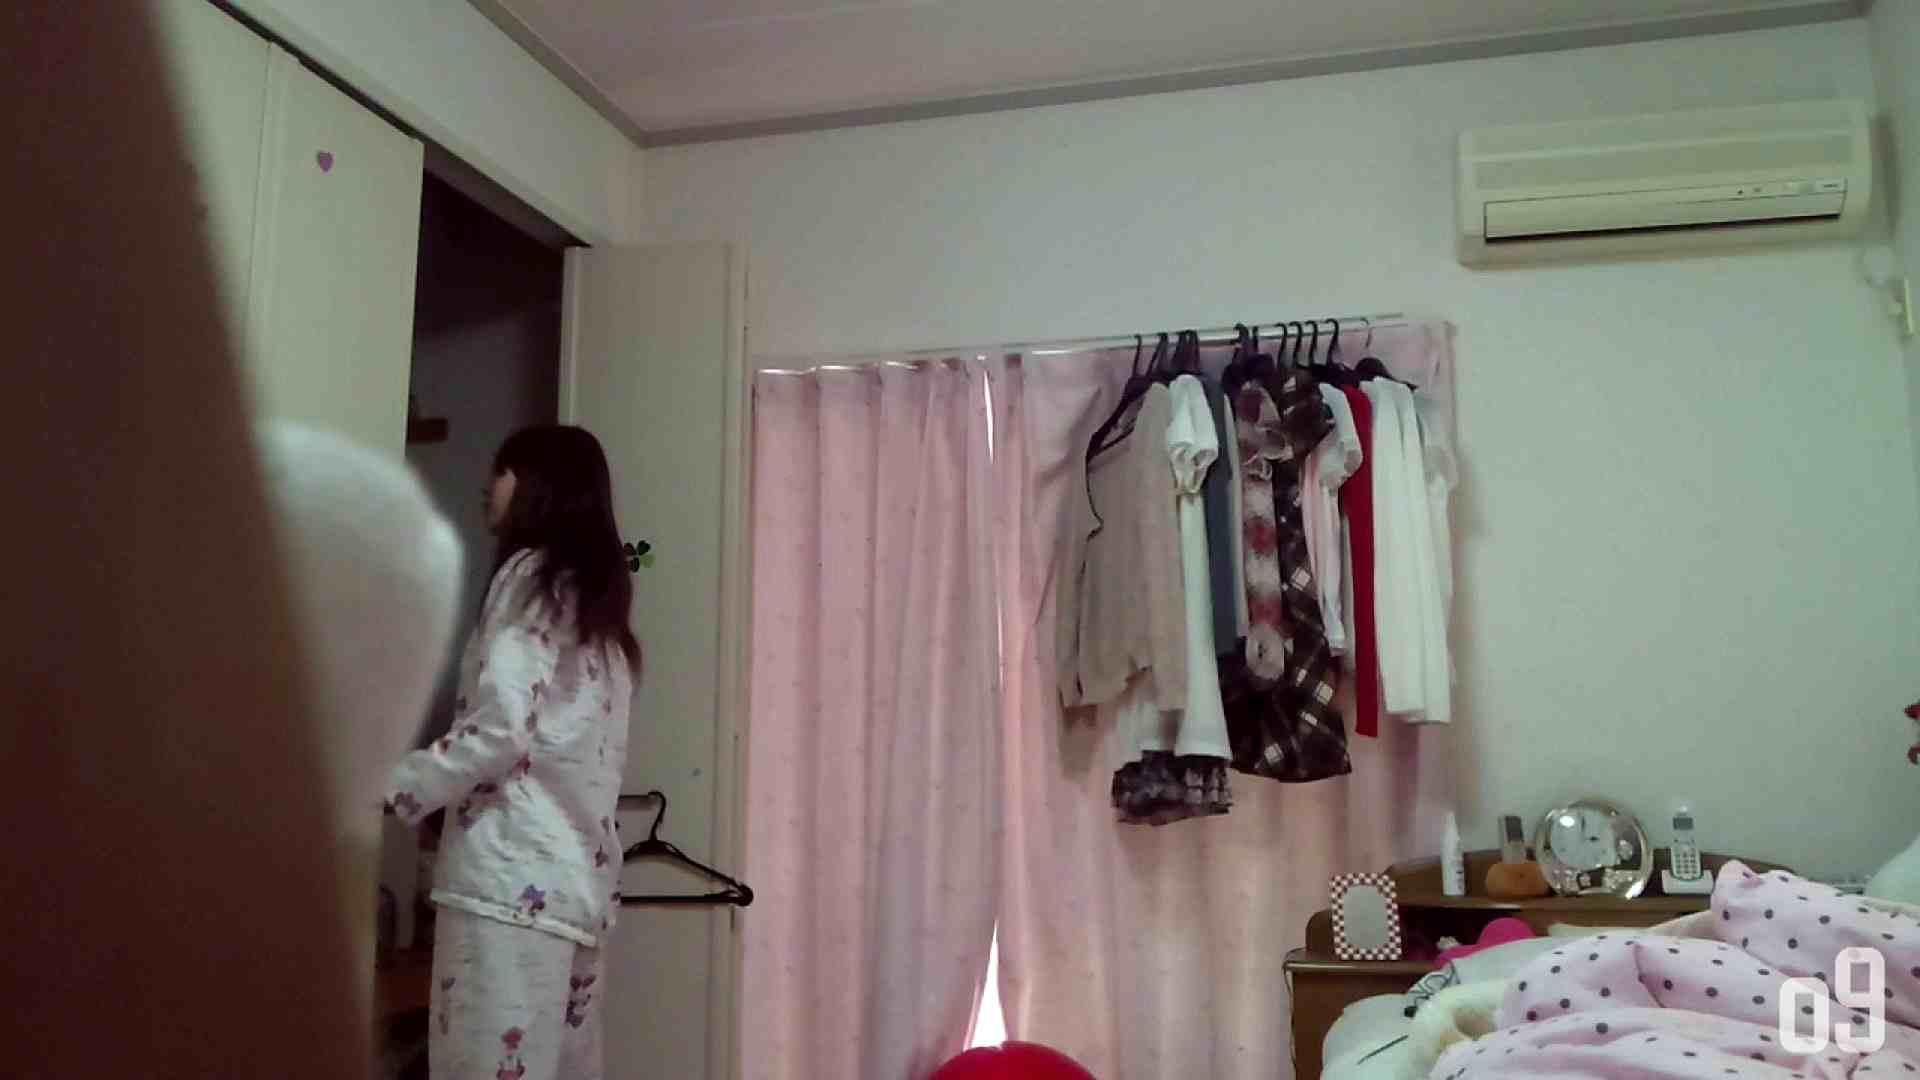 vol.2 瑞希ちゃんの自宅公開!寝起きの着替え・・・ラリルそー OLヌード天国  94PIX 14